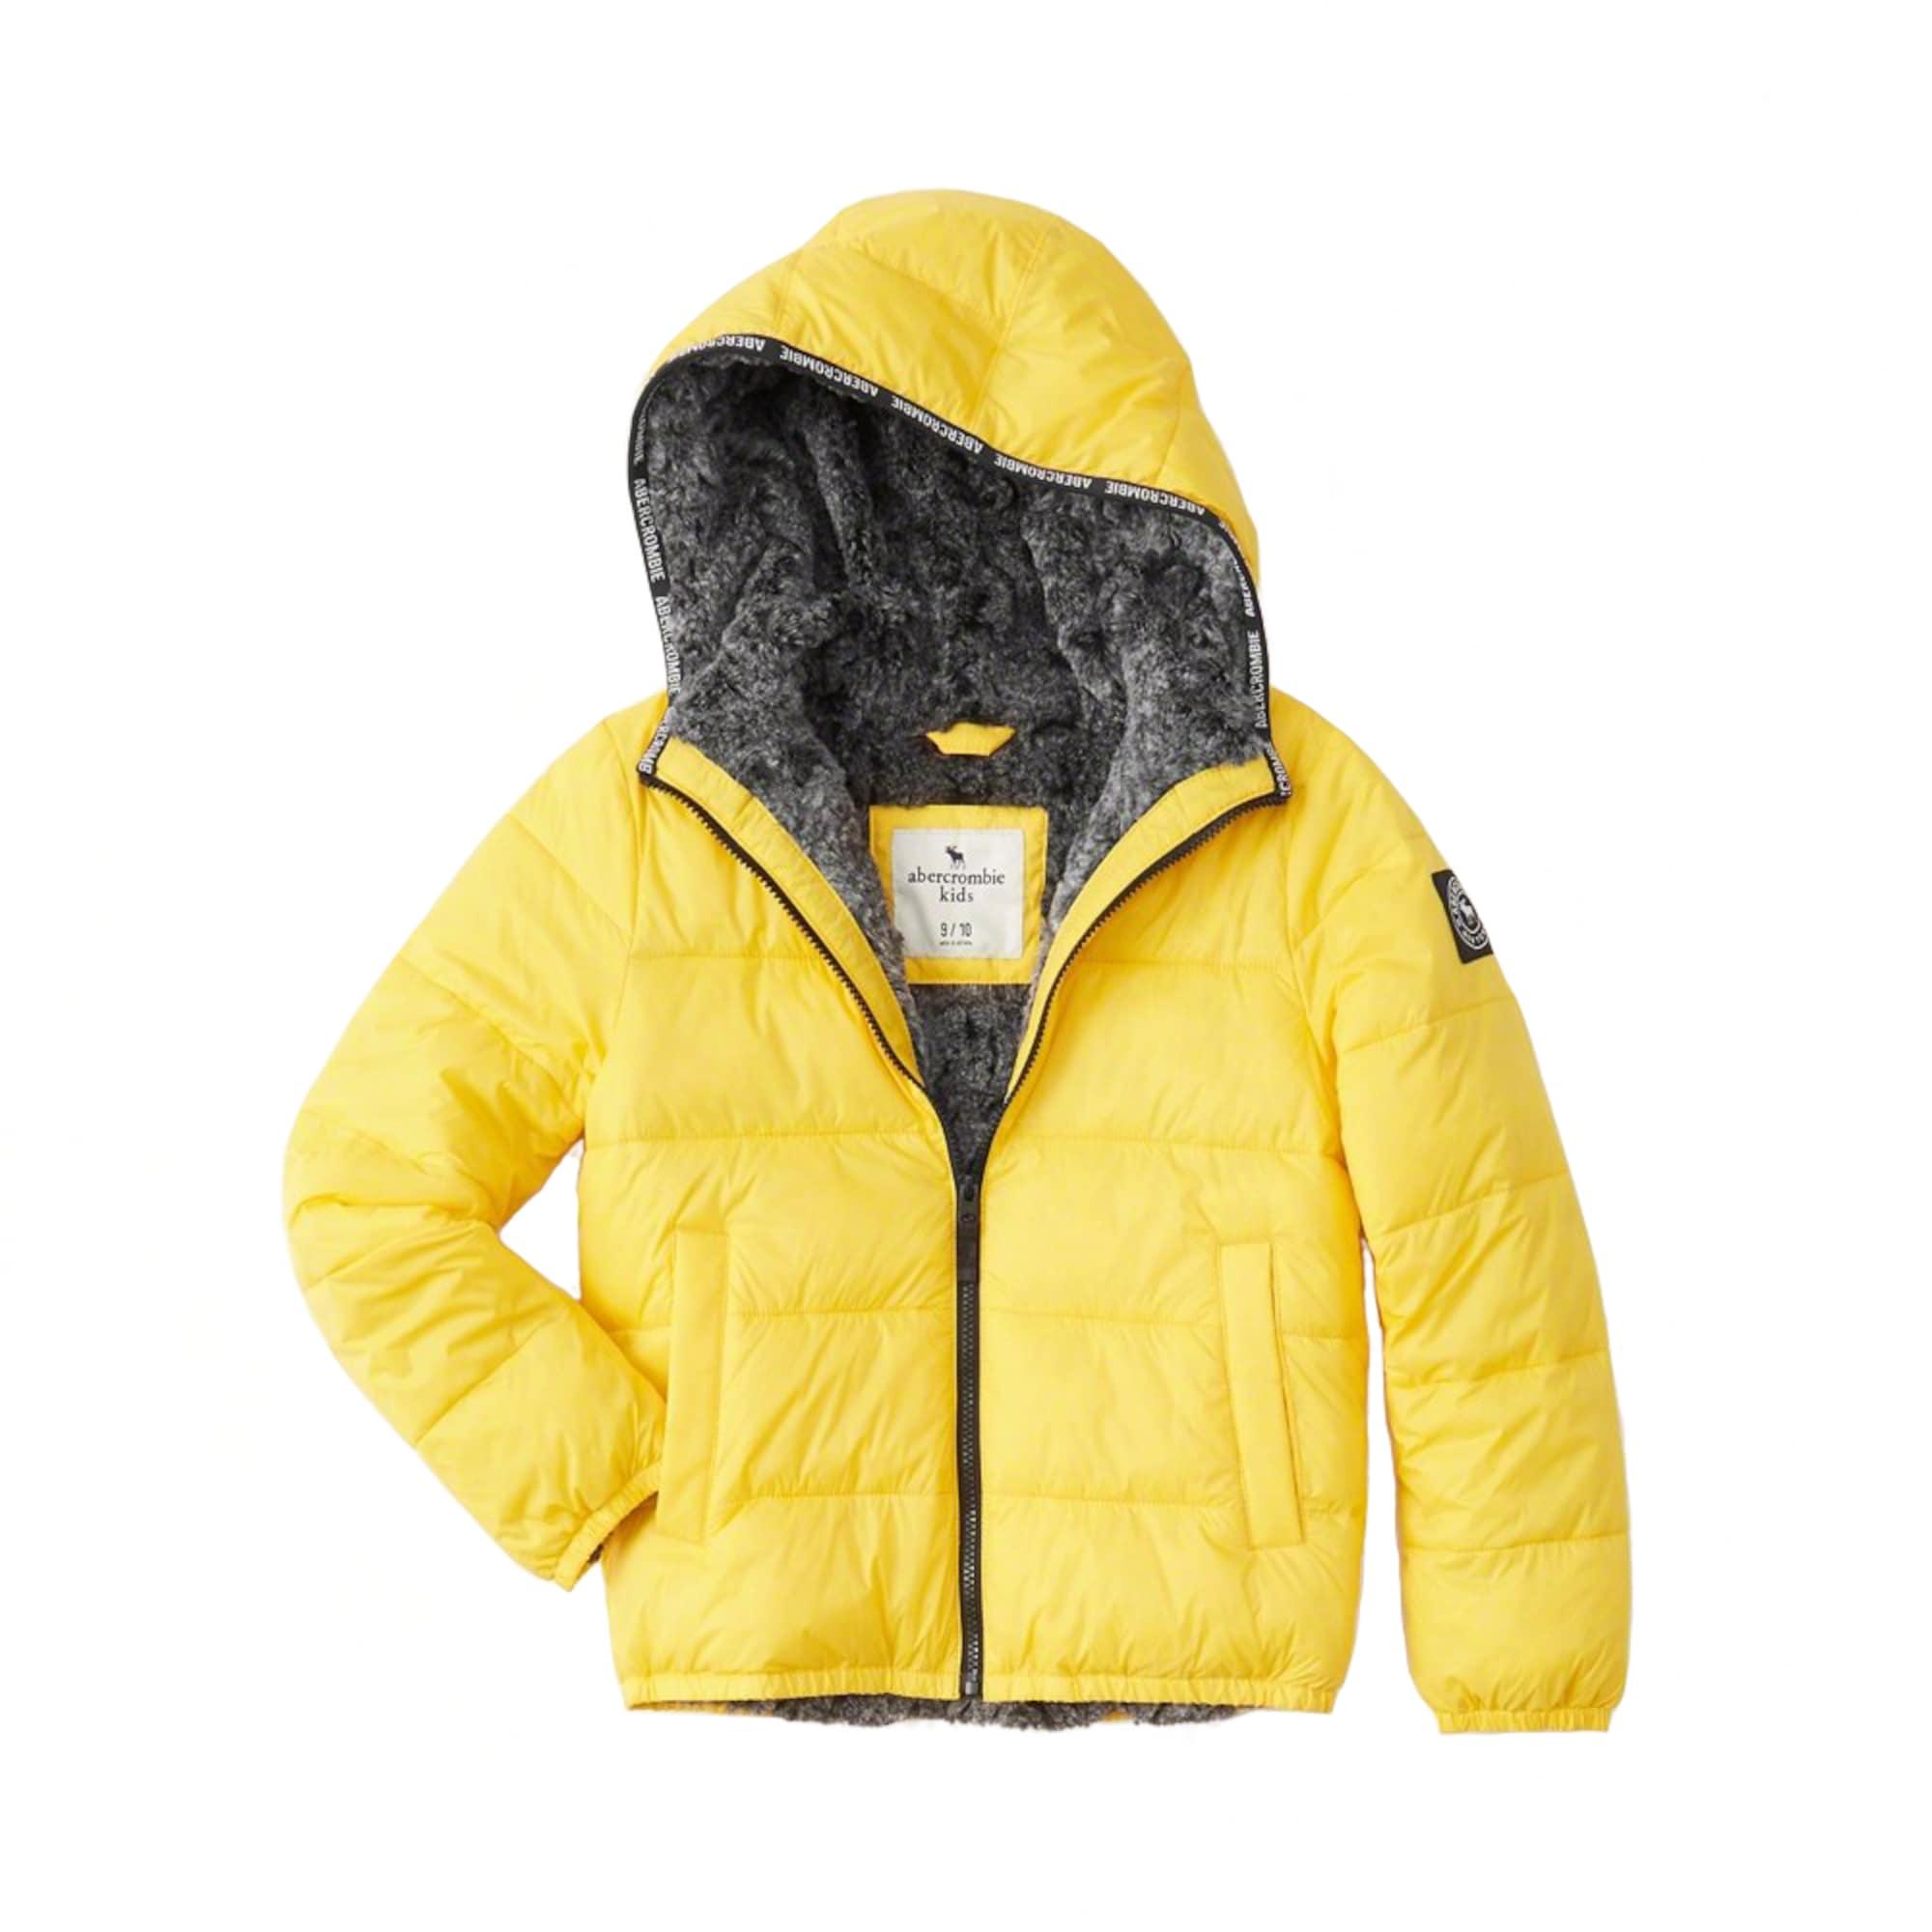 Kinder,  Jungen Abercrombie & Fitch Winterjacke COZY PUFFER gelb   04061413790342